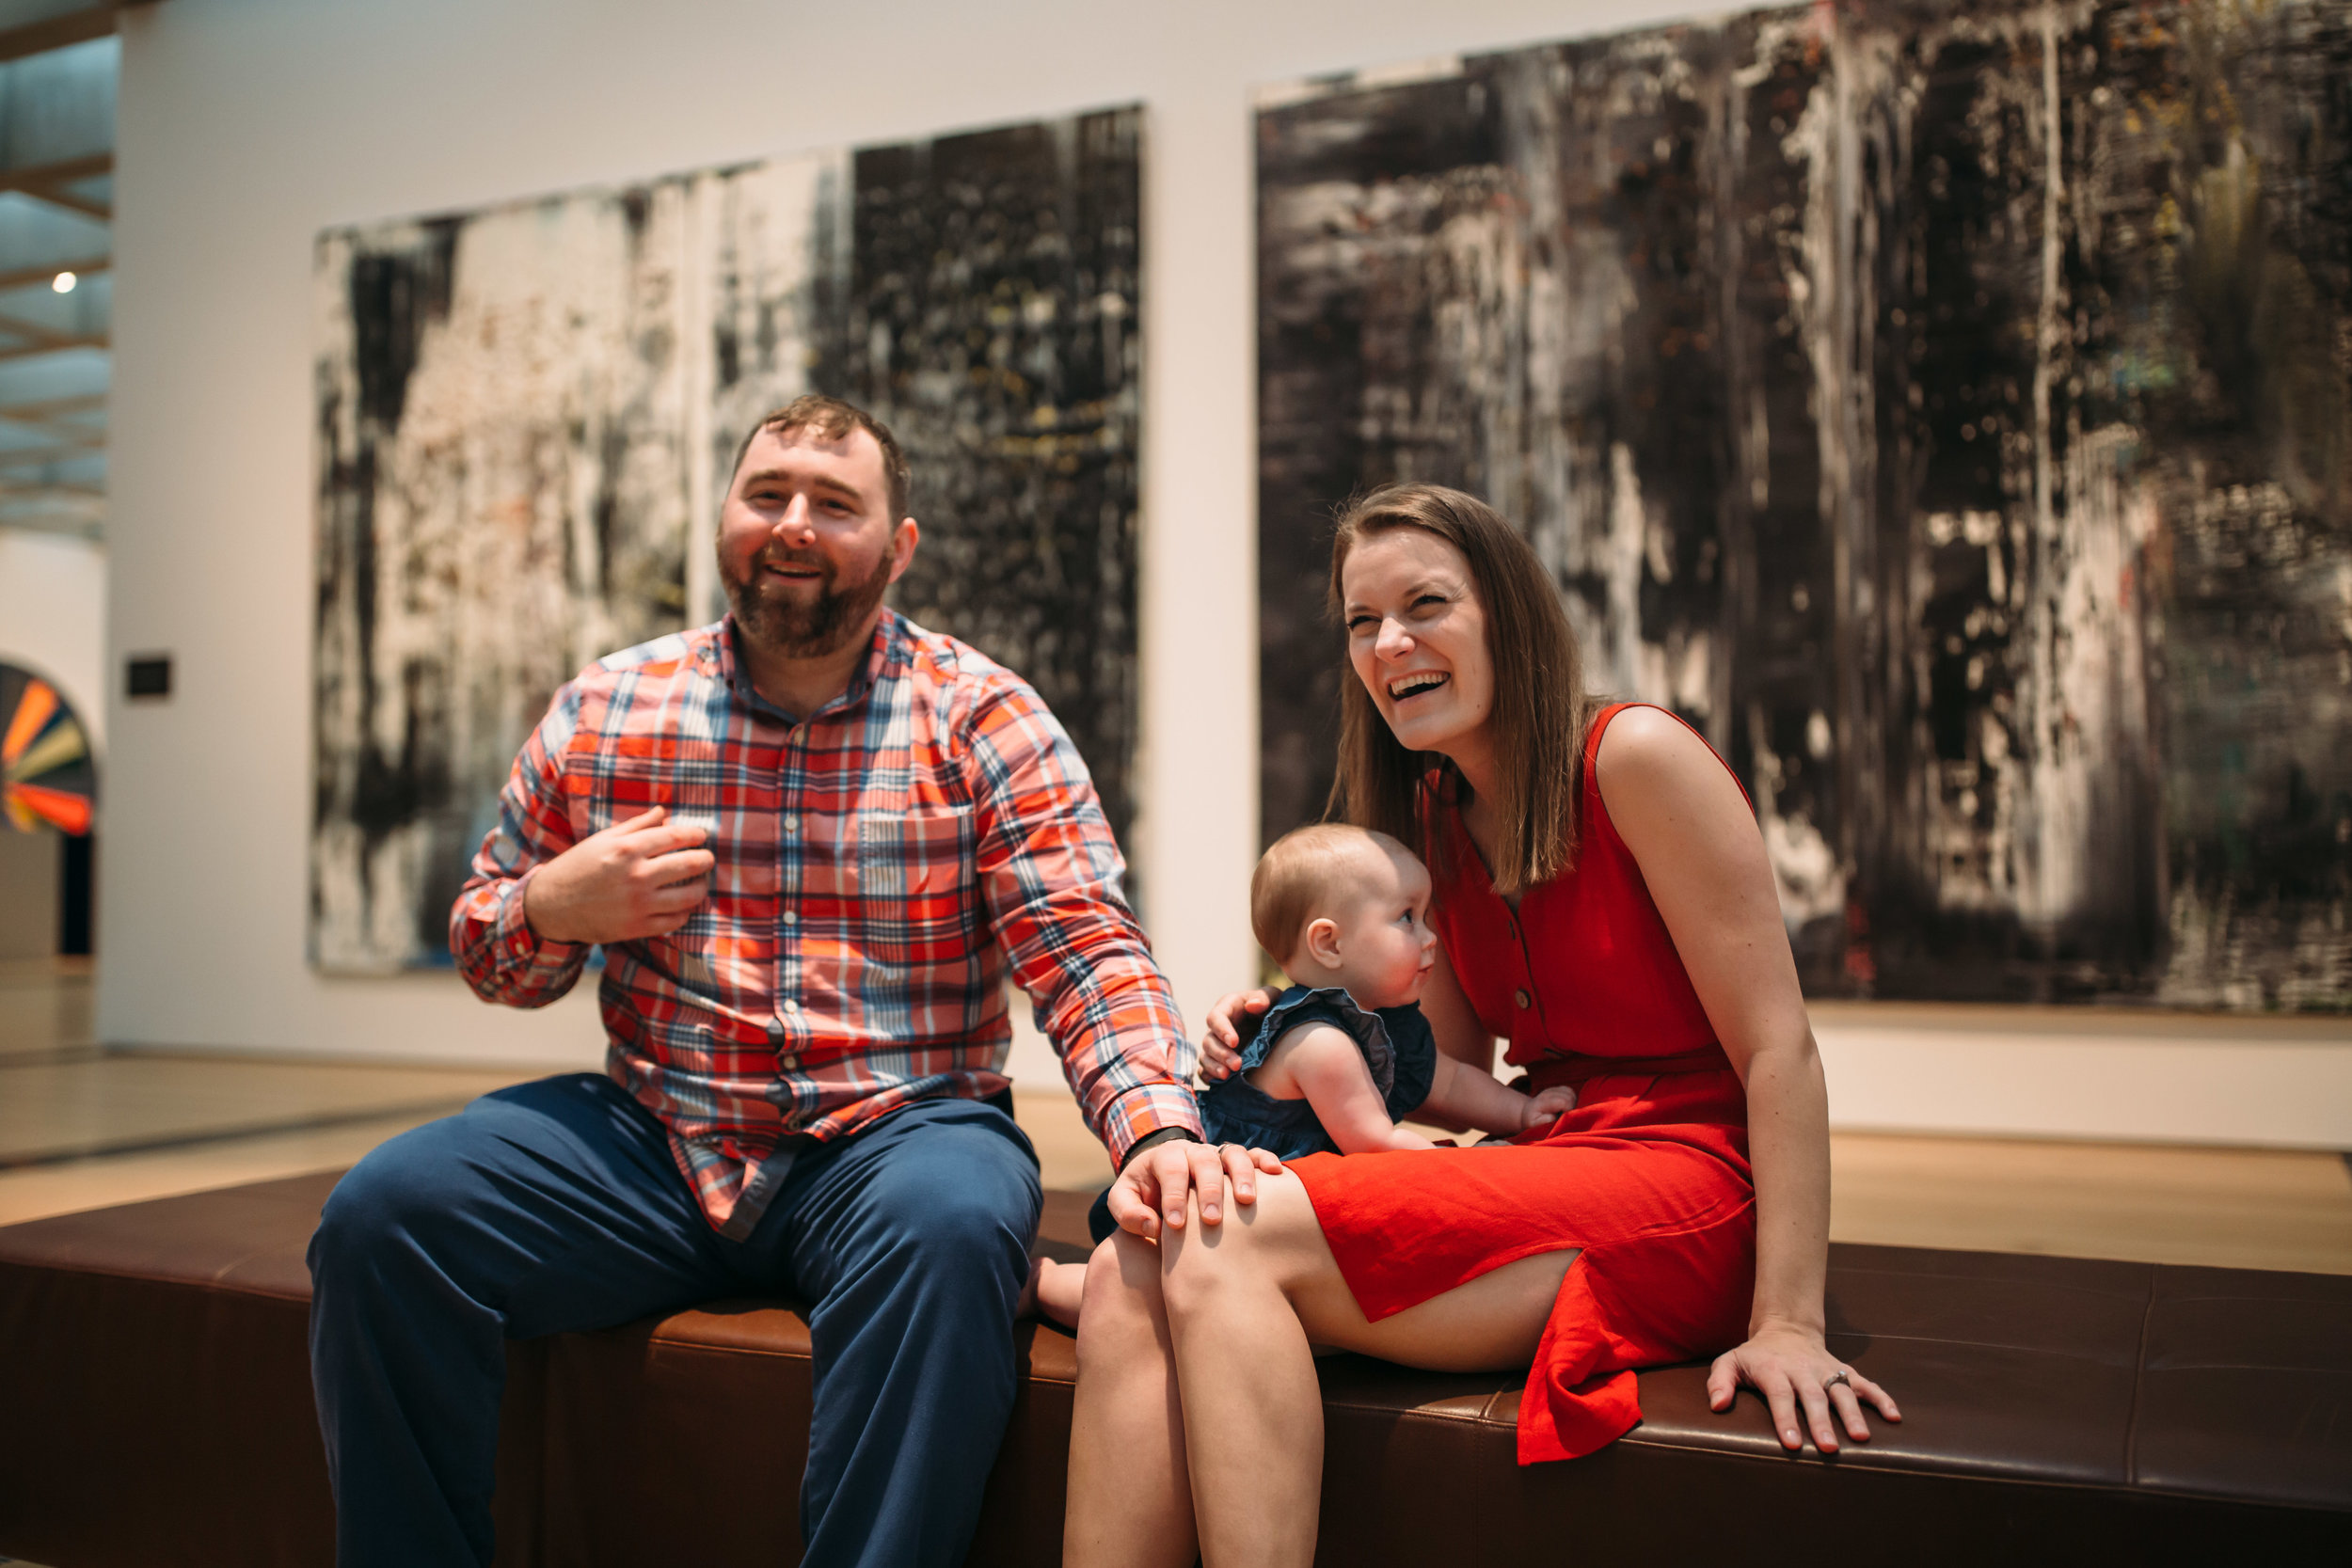 st louis art museum, lifestyle family photographer,